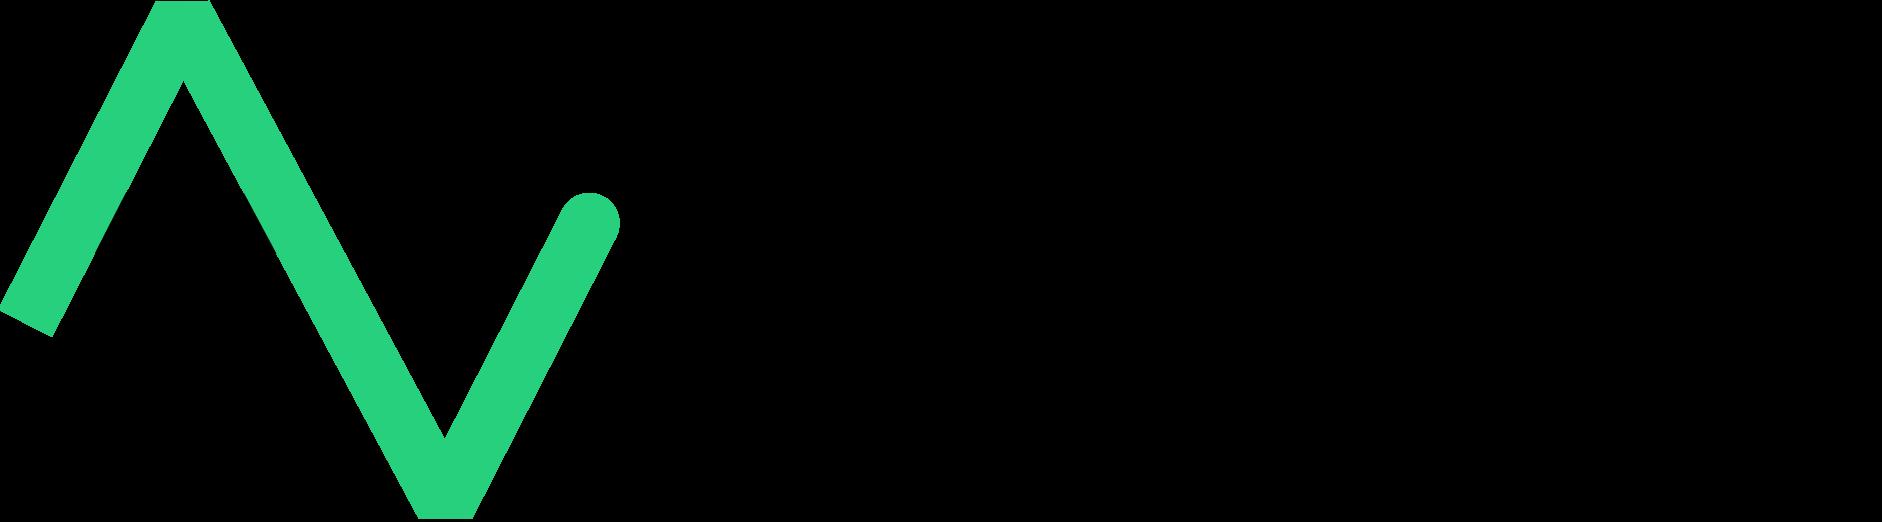 Azets-logo-1-RGB-v1 kopio